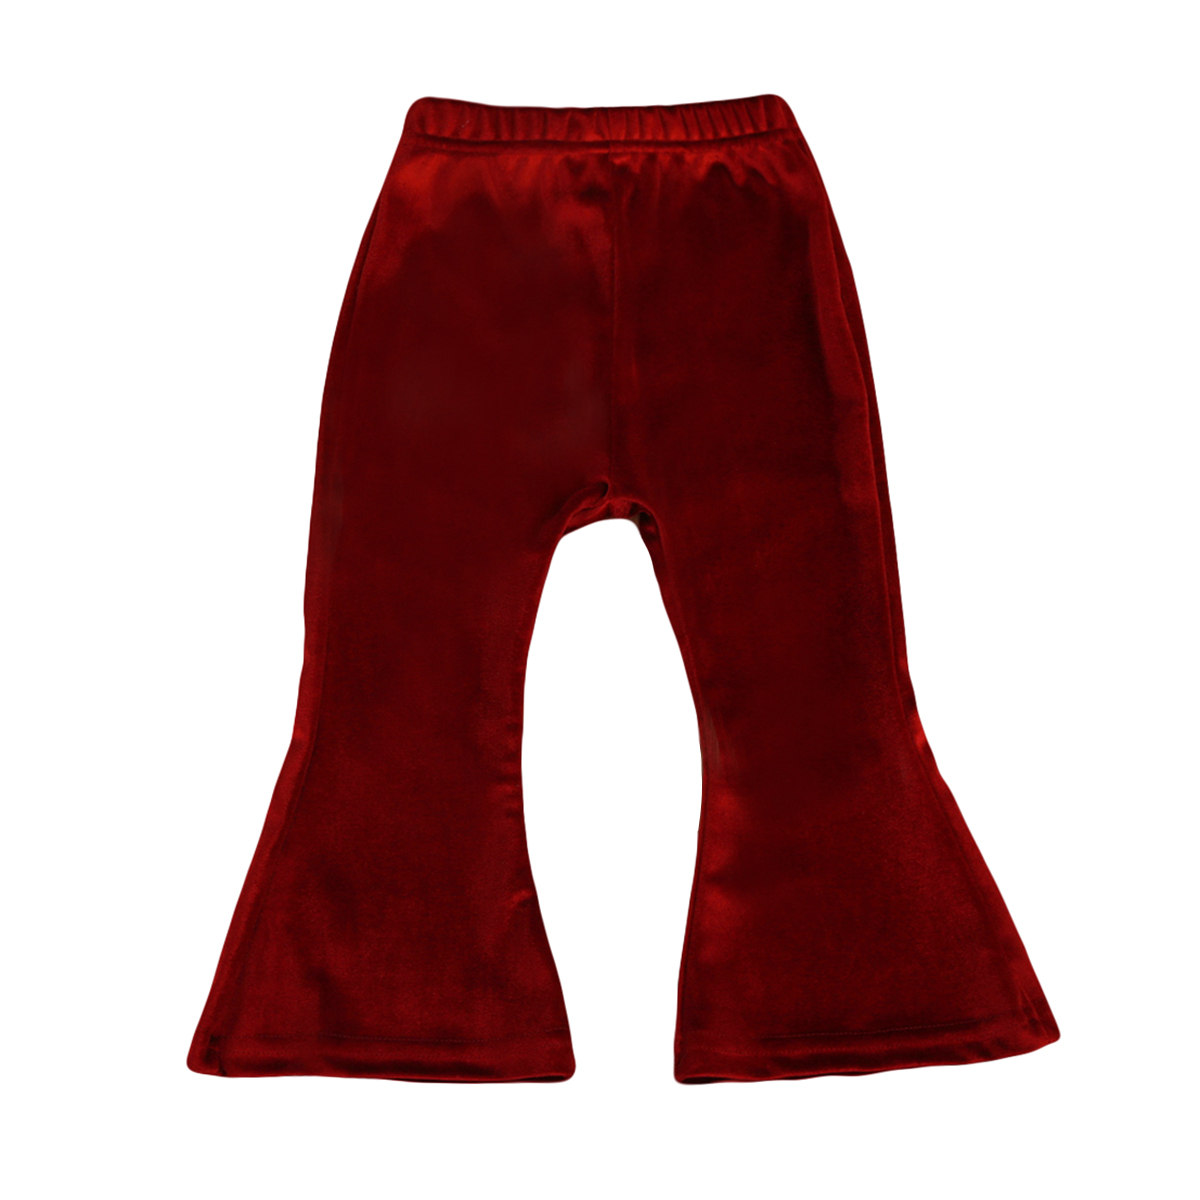 2colors Boho Pants Fashion Bell Bottom Wide Leg Flare Stretch Pants Kids Baby Girls Trousers